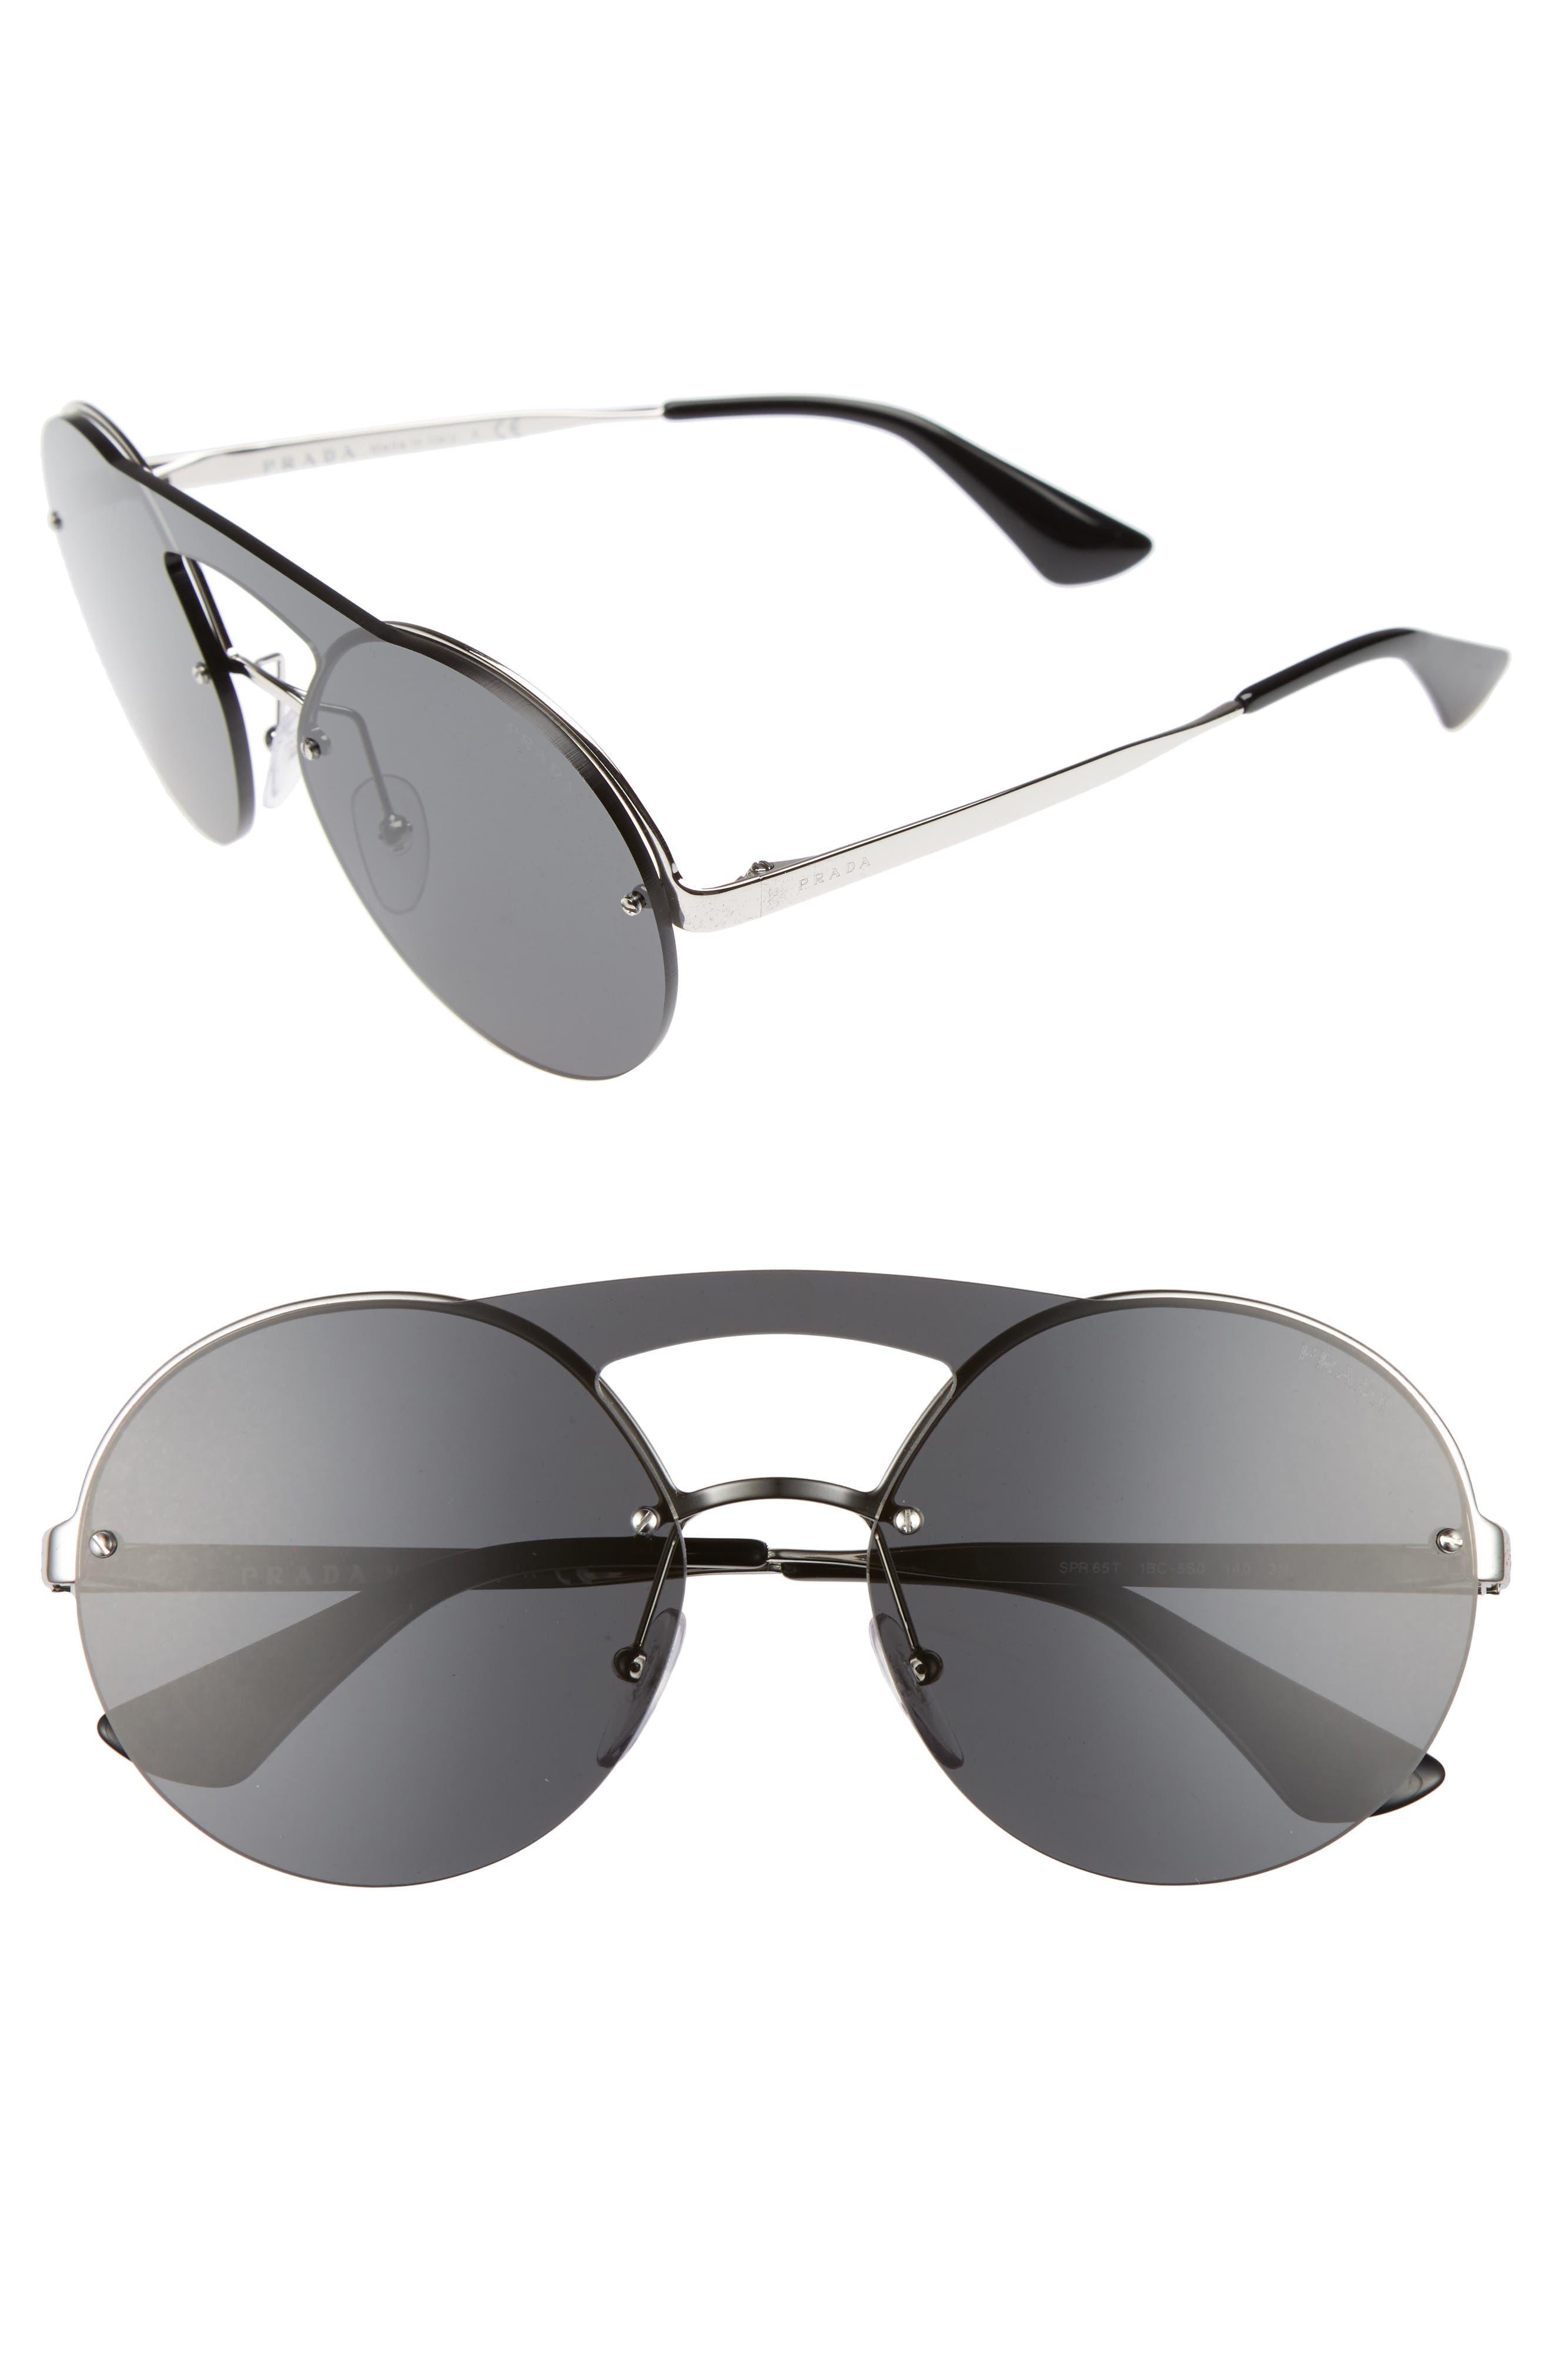 60mm Round Rimless Sunglasses,                             Main thumbnail 1, color,                             020